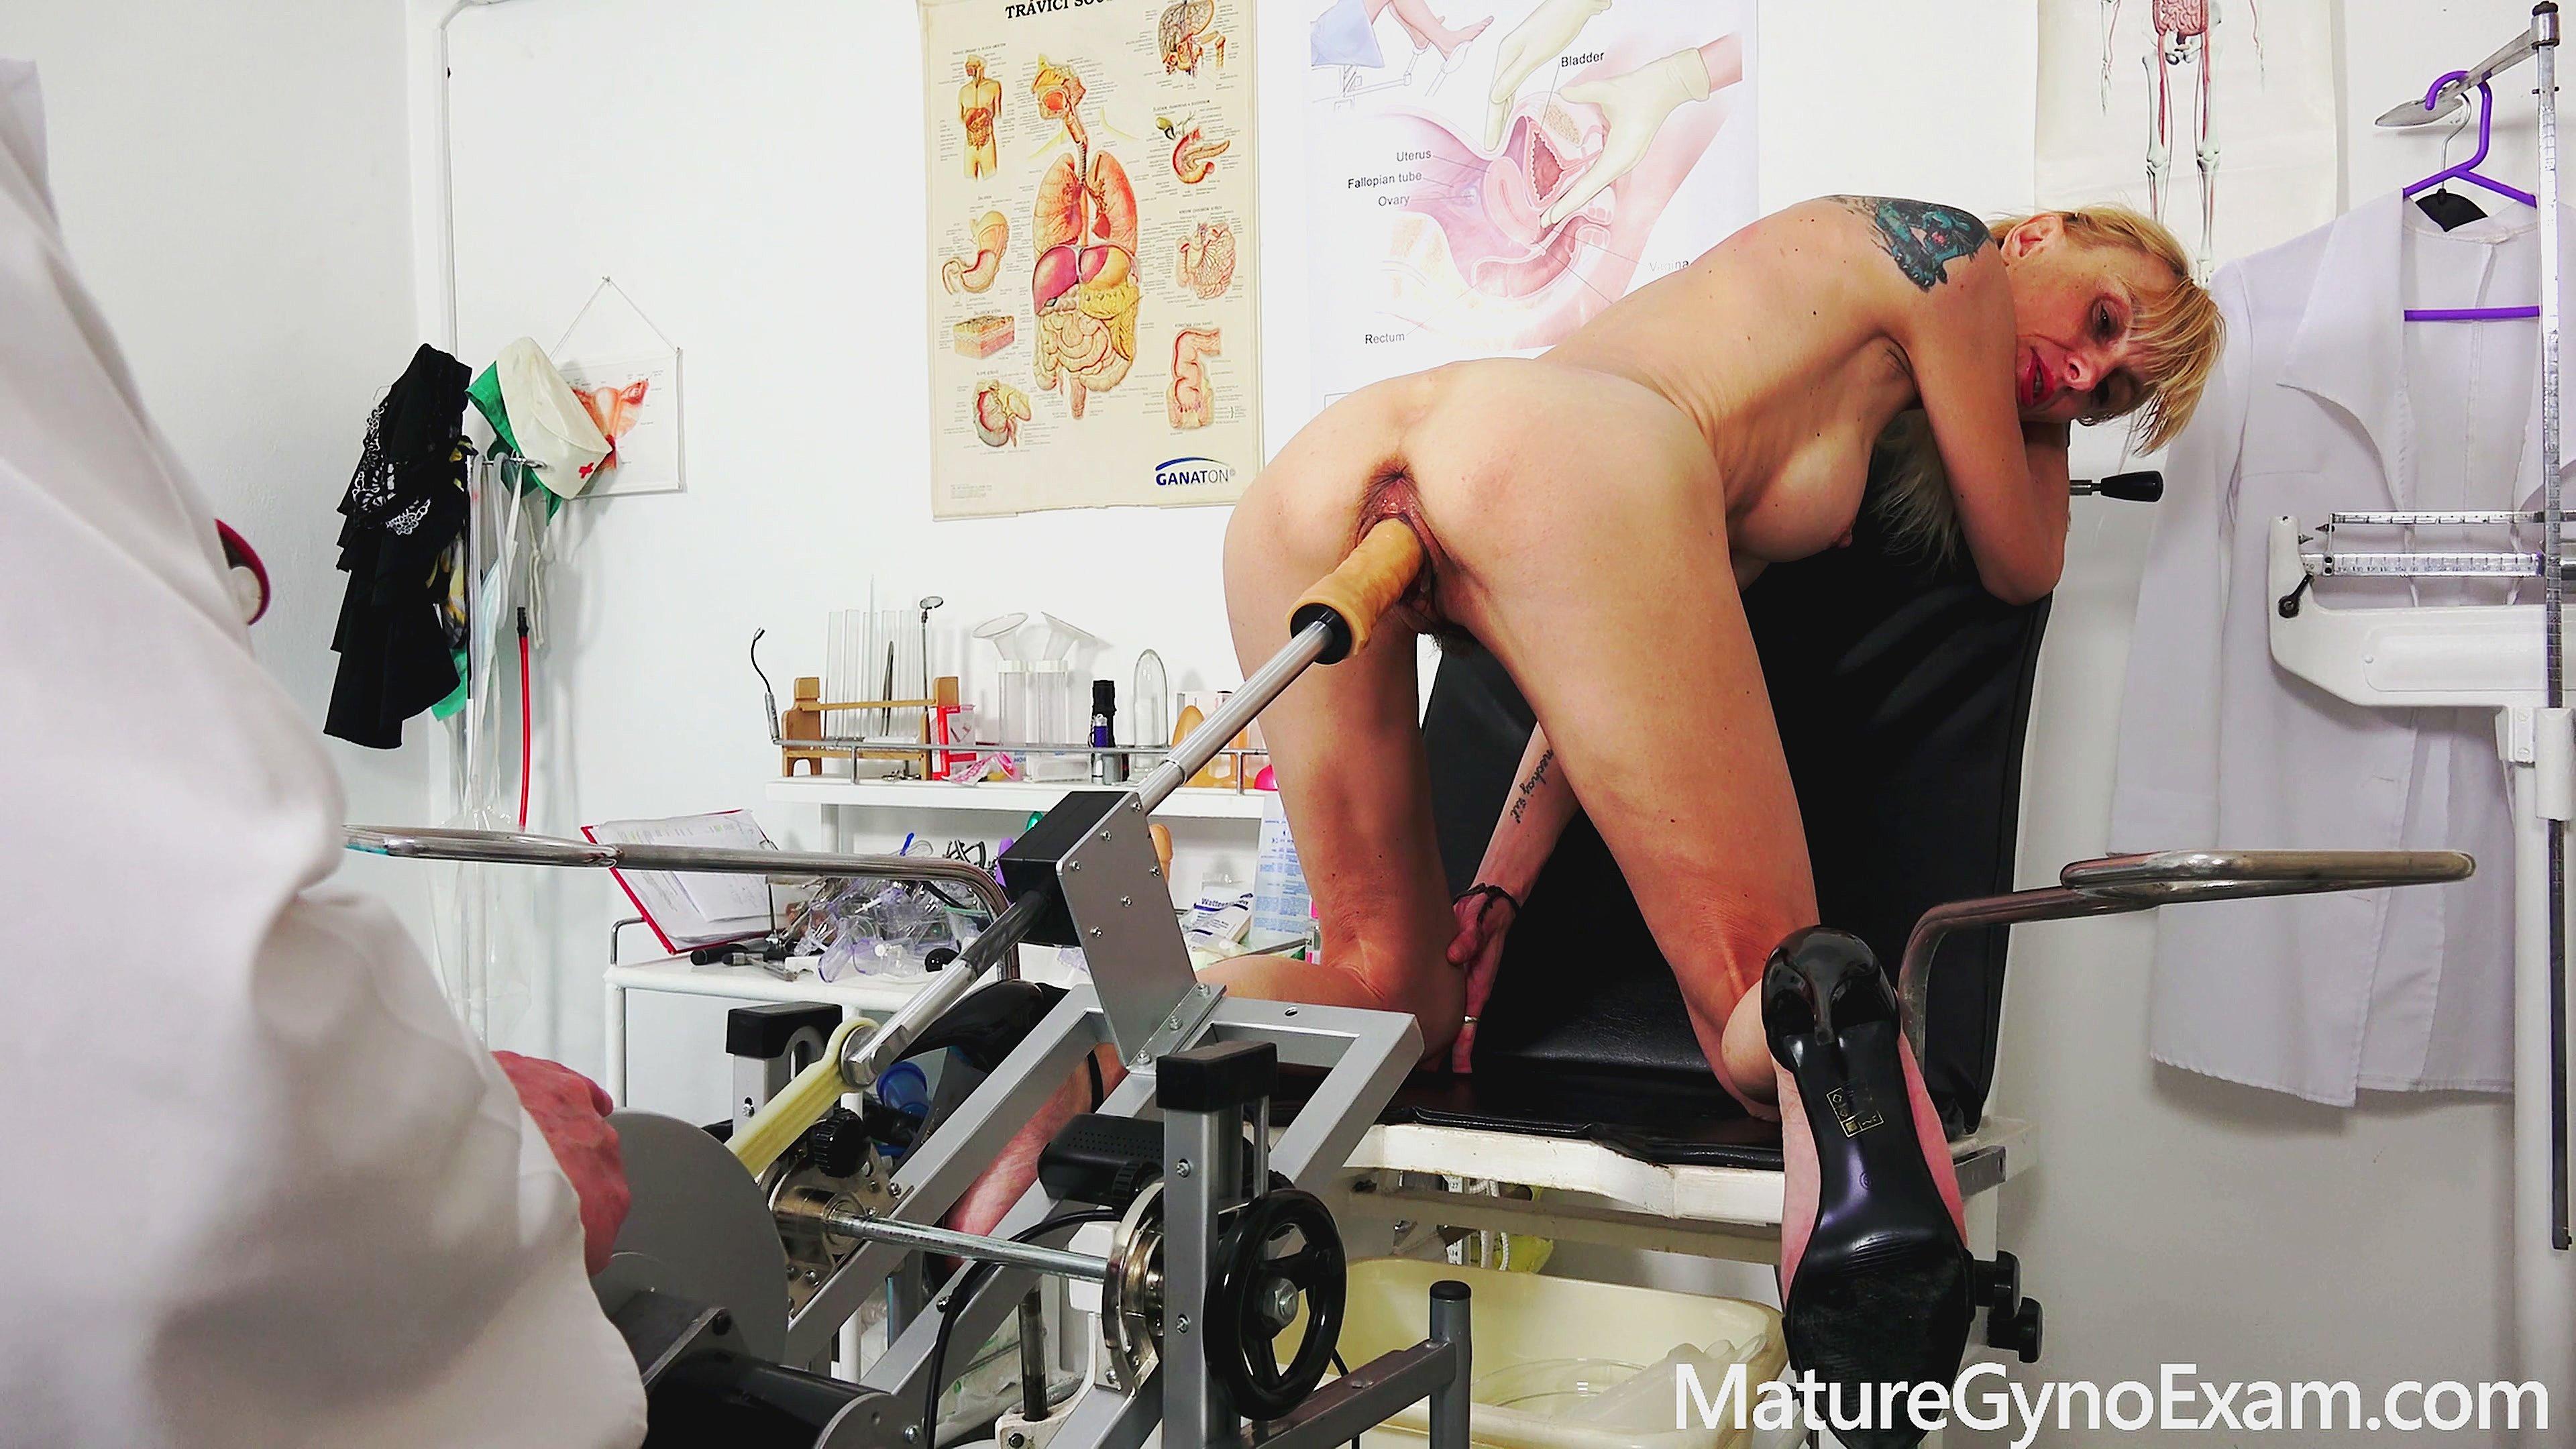 Sexy Mature Woman Kinky Gyno Exam  Fuckmachine Orgasm In -4070